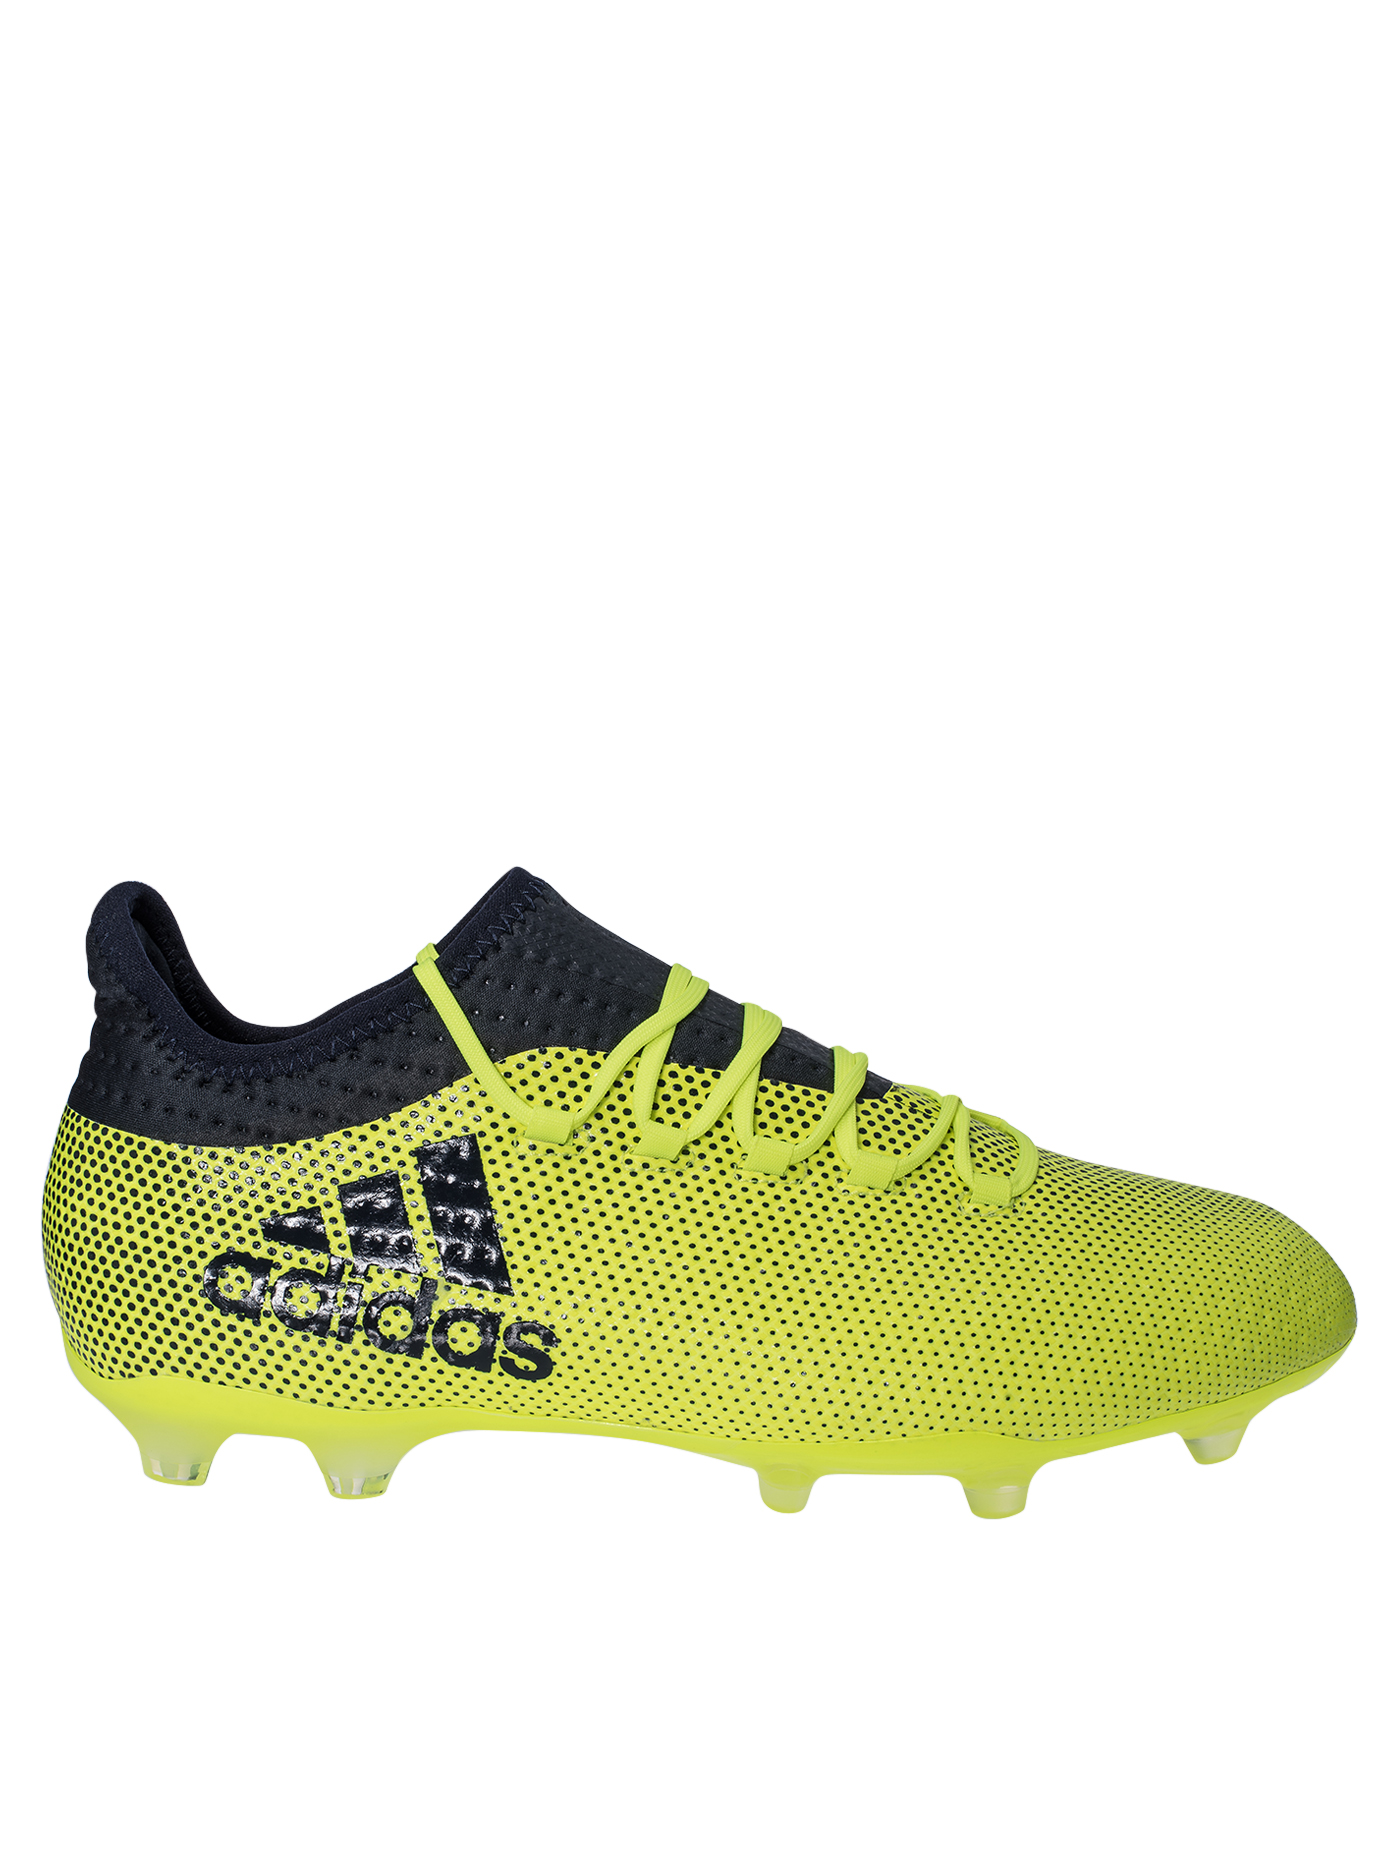 a4be0bea6252 ADIDAS รองเท้าฟุตบอลผู้ชาย รุ่น X 17.2 FG S82325 ไซส์ UK7 สี Solar  Yellow-Legend